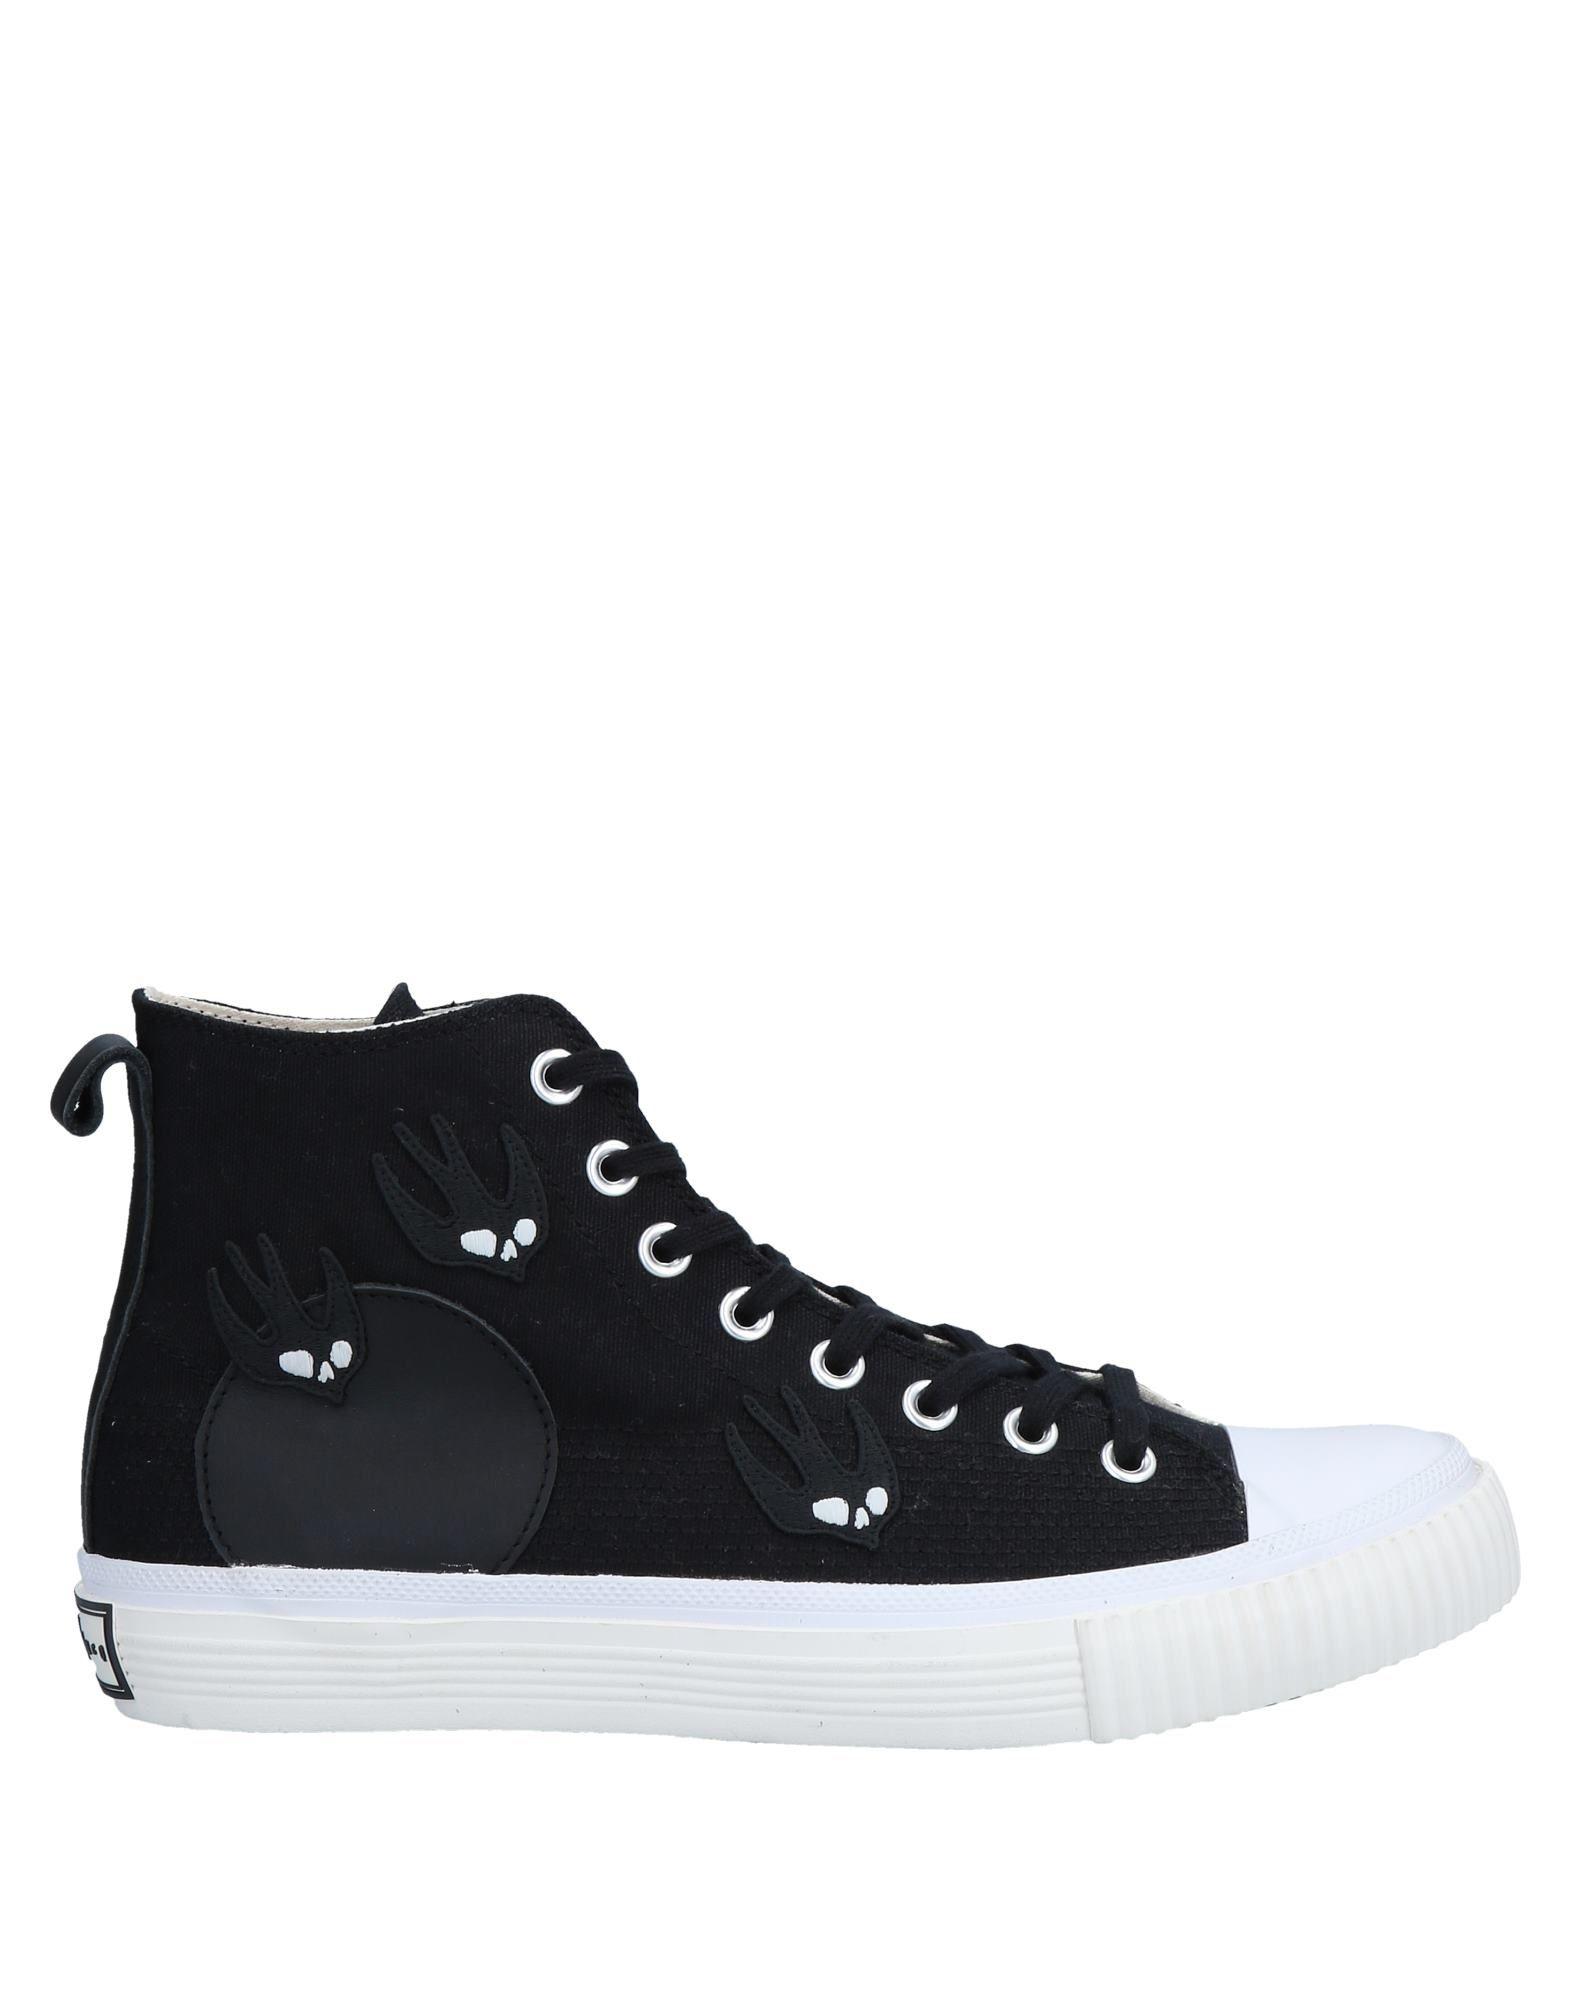 d3da699e Mcq Alexander Mcqueen Sneakers - Men Mcq Alexander Mcqueen Sneakers ...